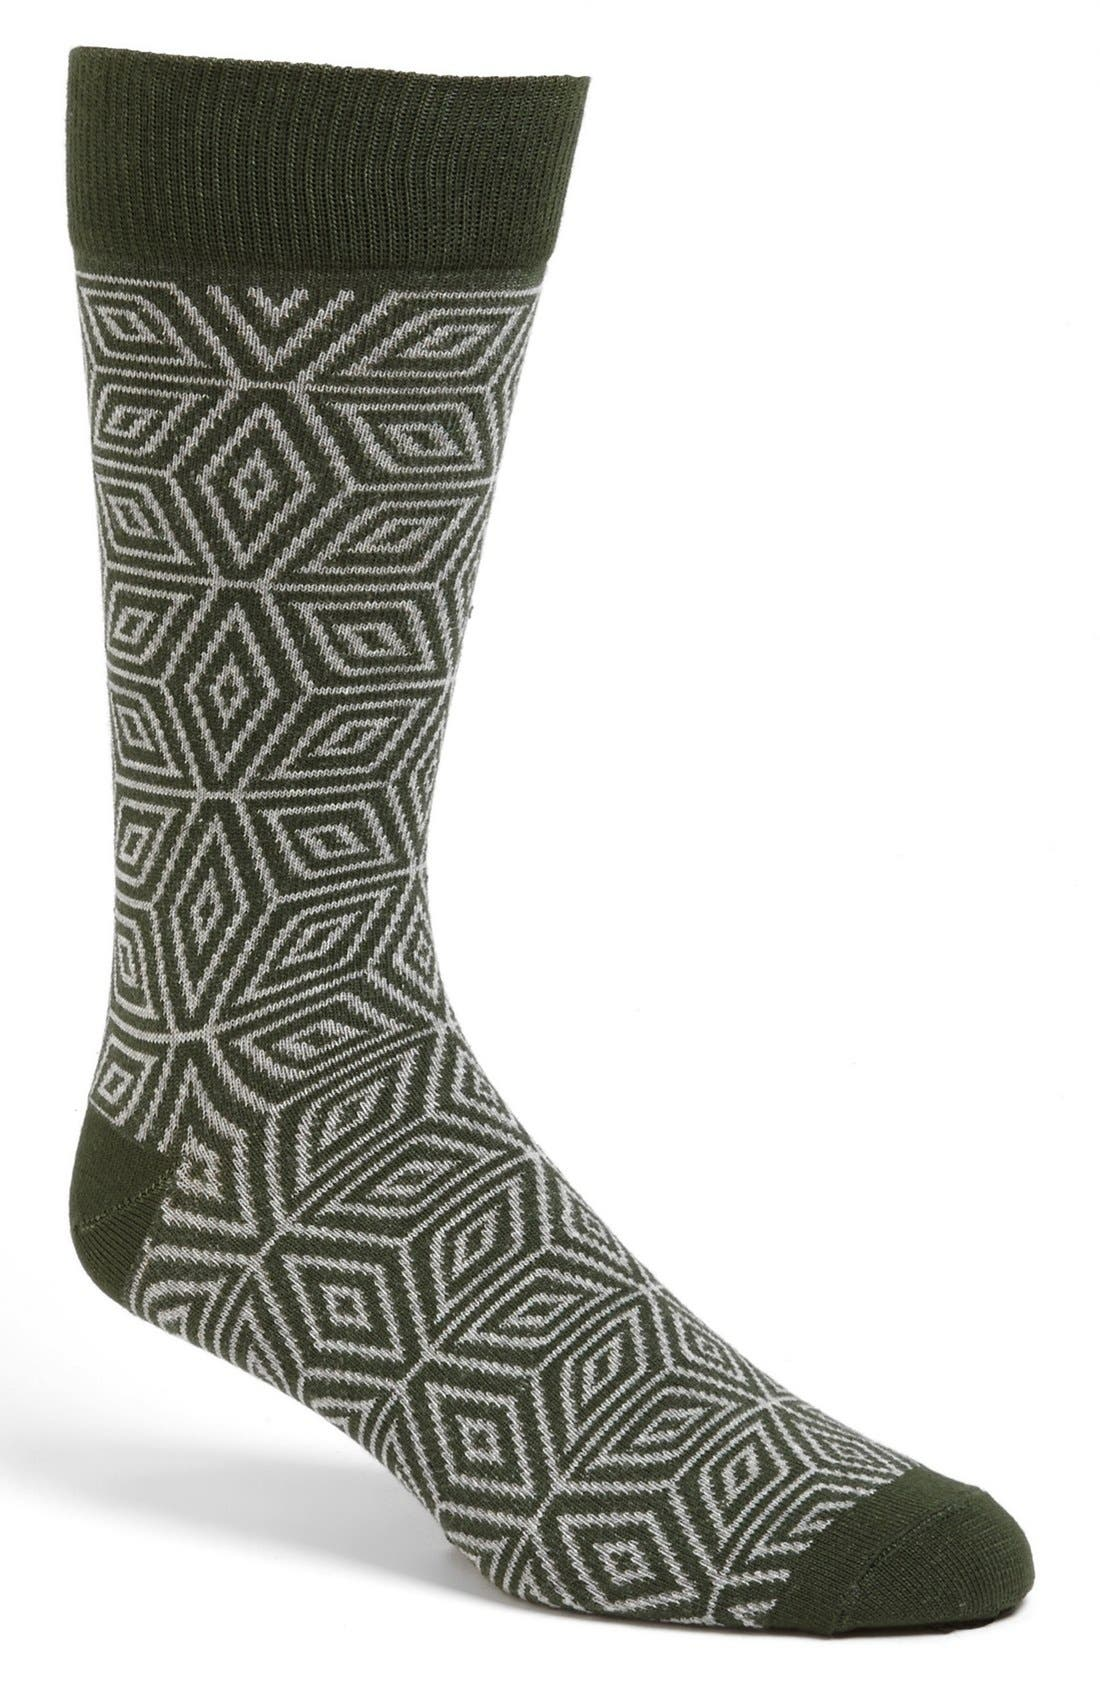 Alternate Image 1 Selected - Pact 'North Star' Socks